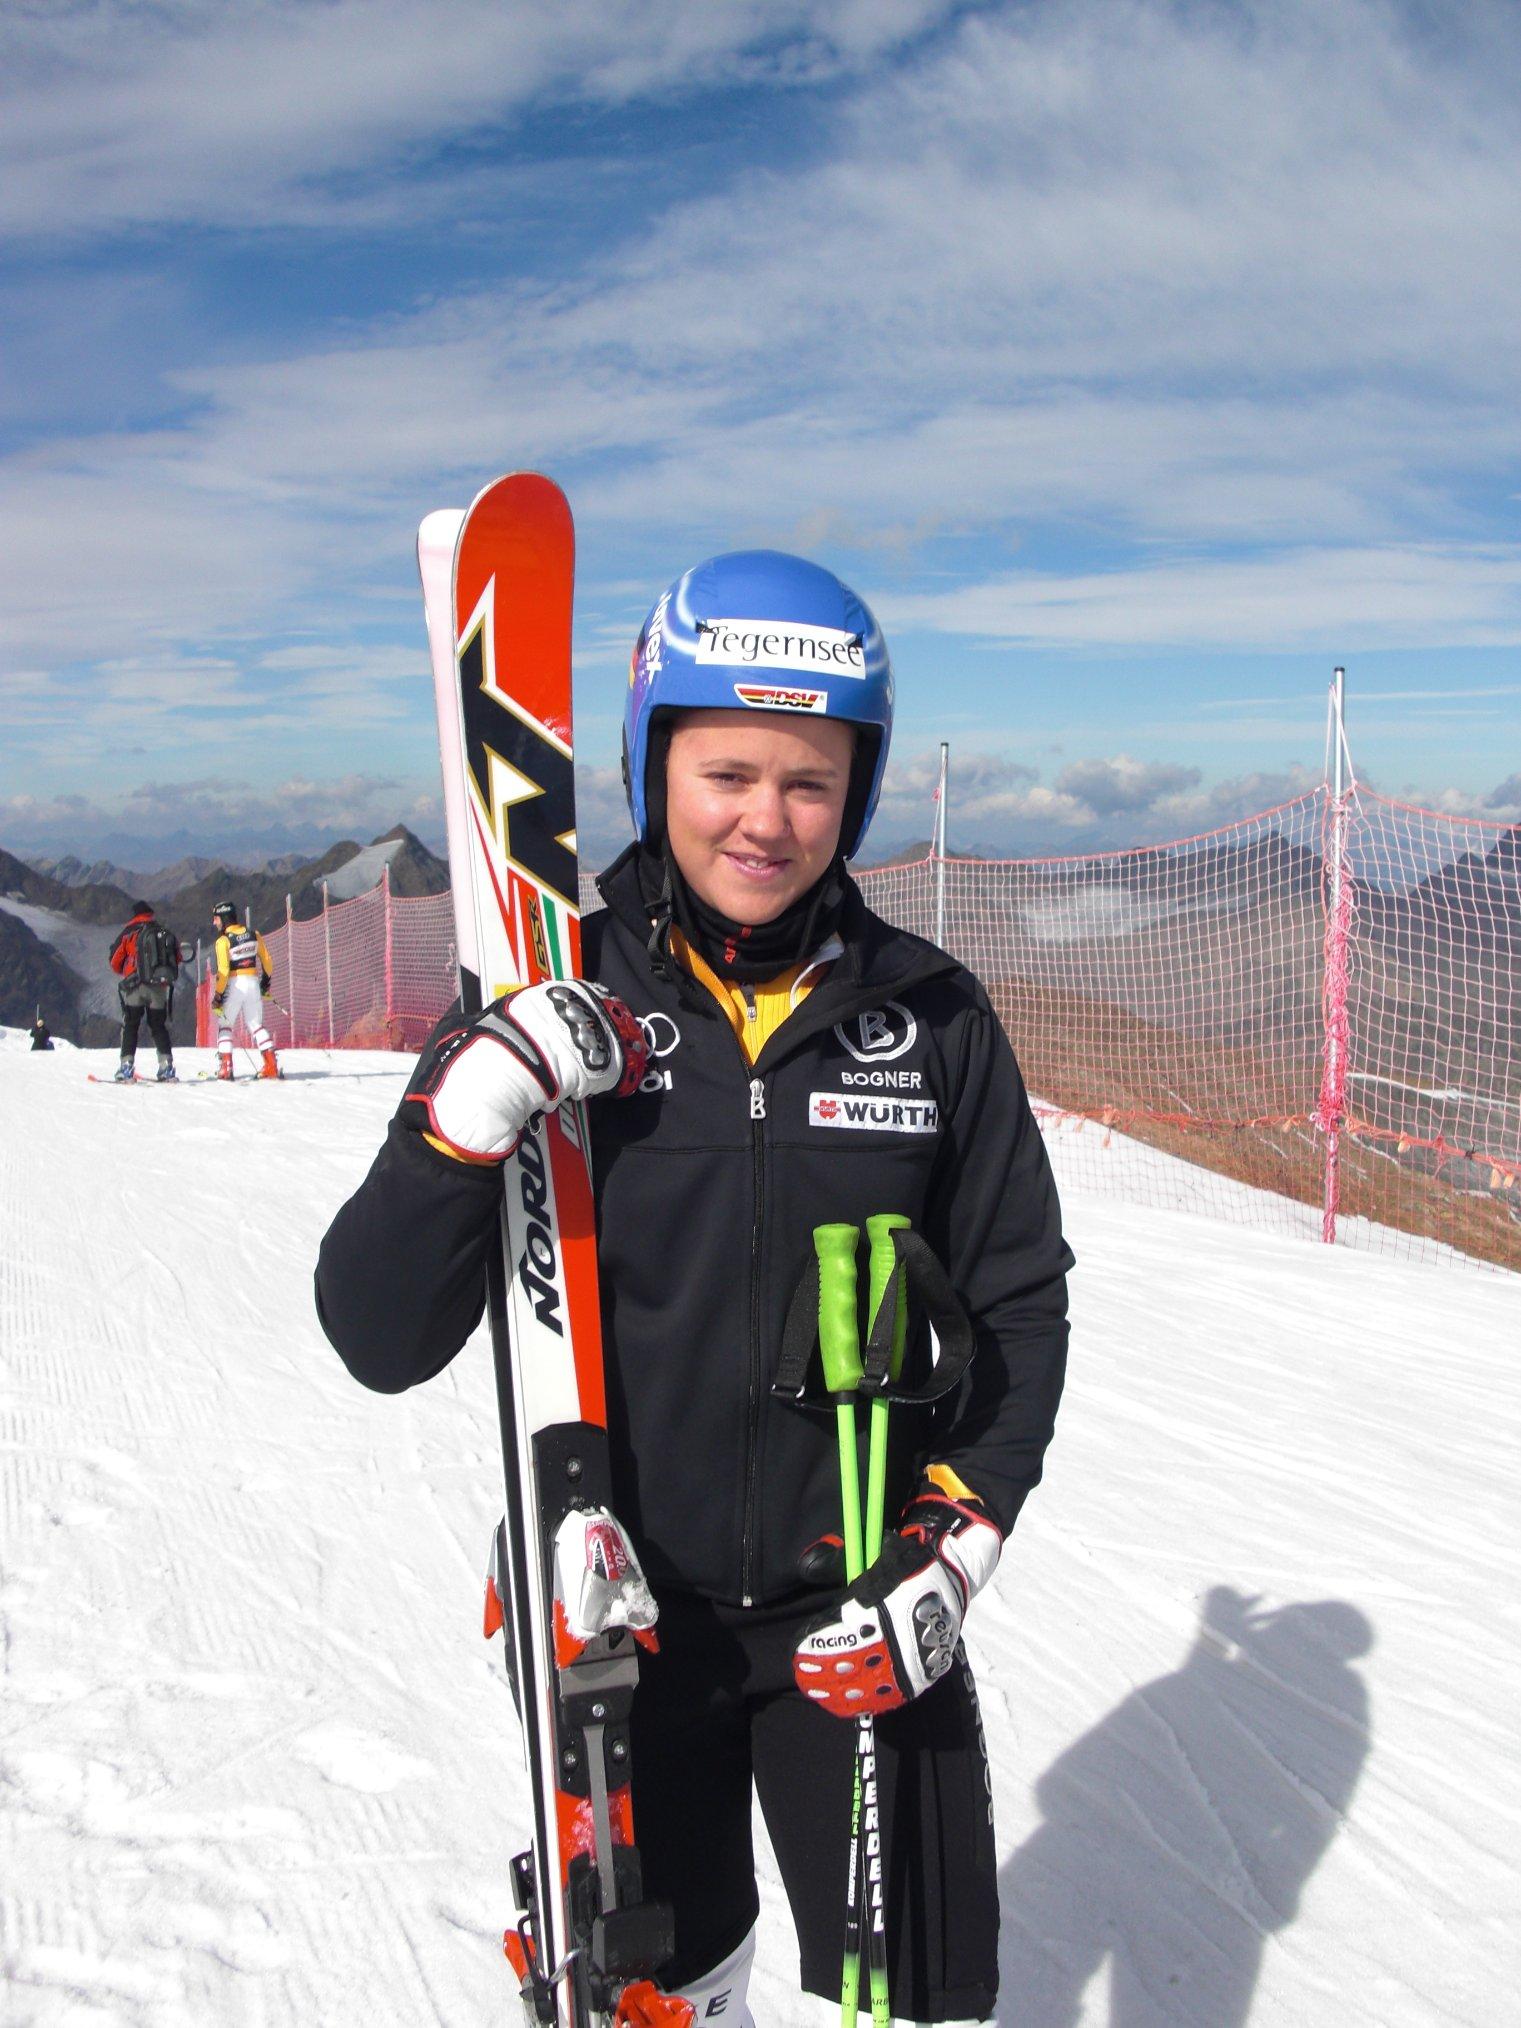 Gold für Viktoria Rebensburg im Riesenslalom